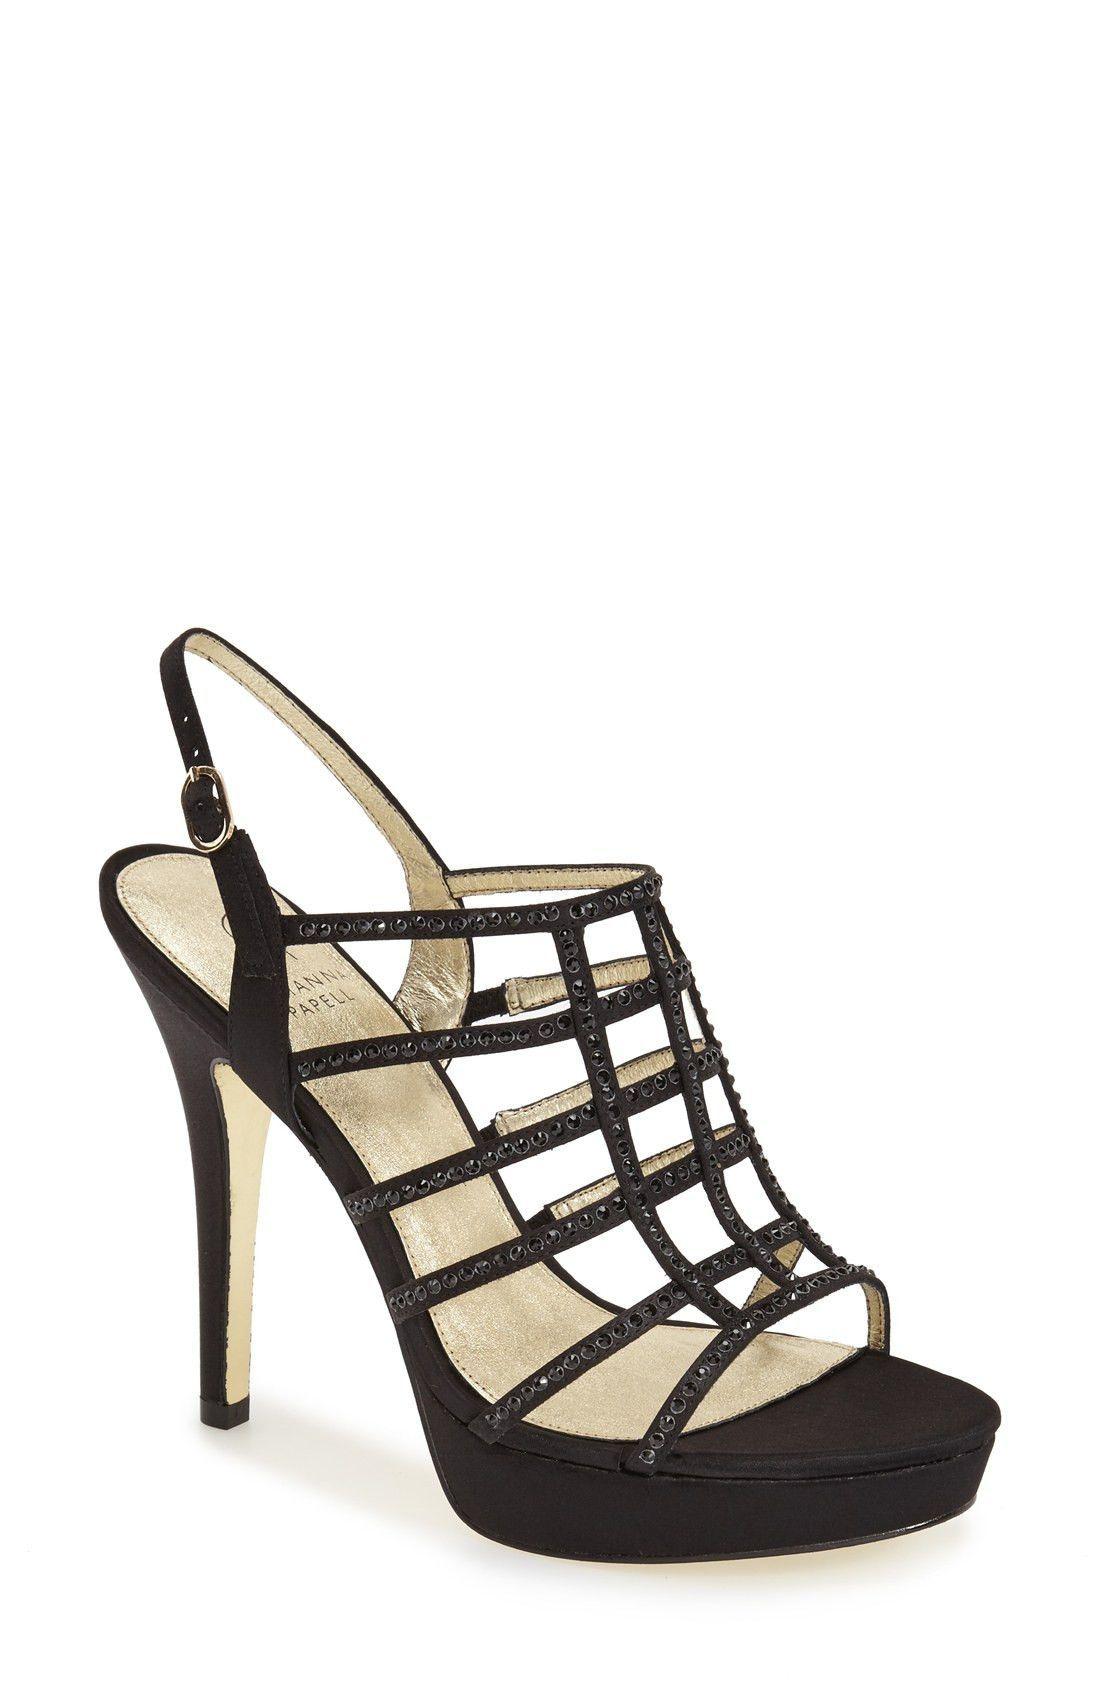 18ebebb2a025 Adrianna Papell  Maya  Caged Platform Sandal (2 Colors)